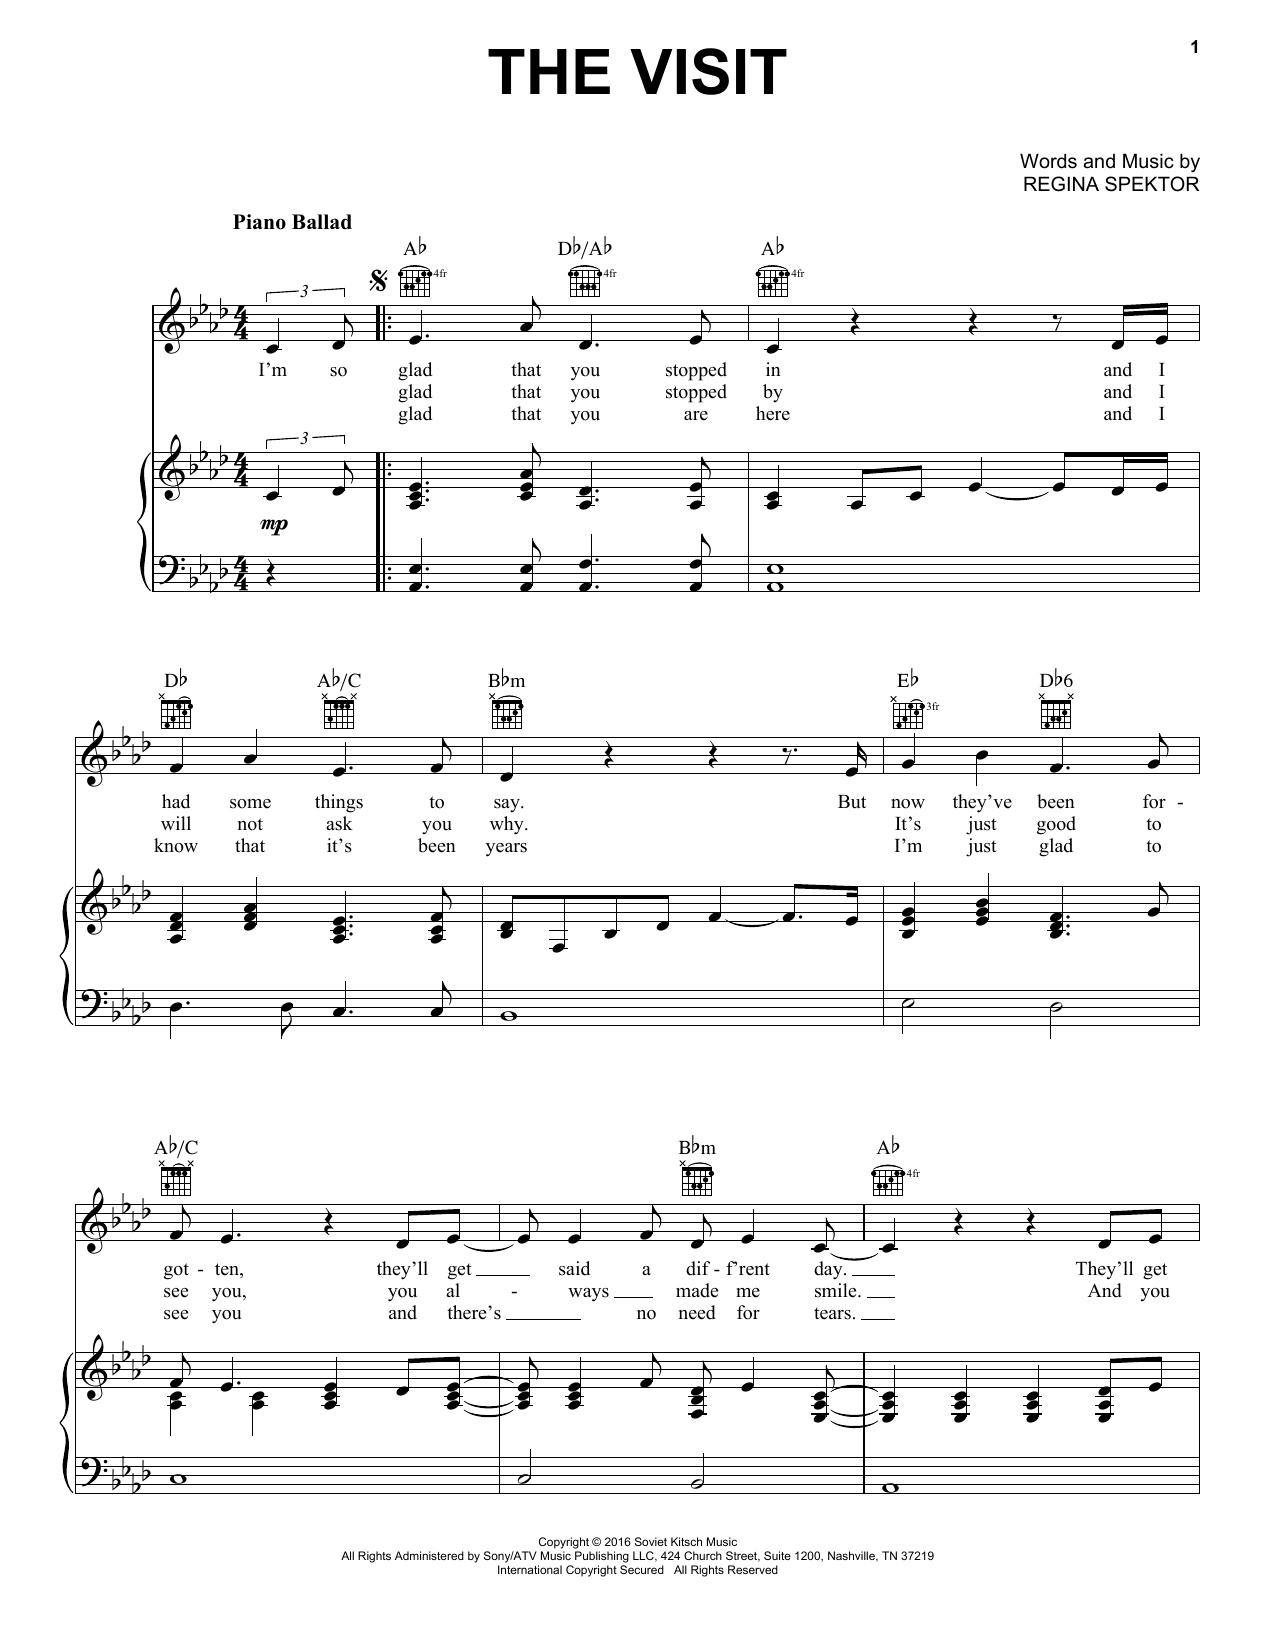 Regina Spektor The Visit sheet music notes and chords. Download Printable PDF.